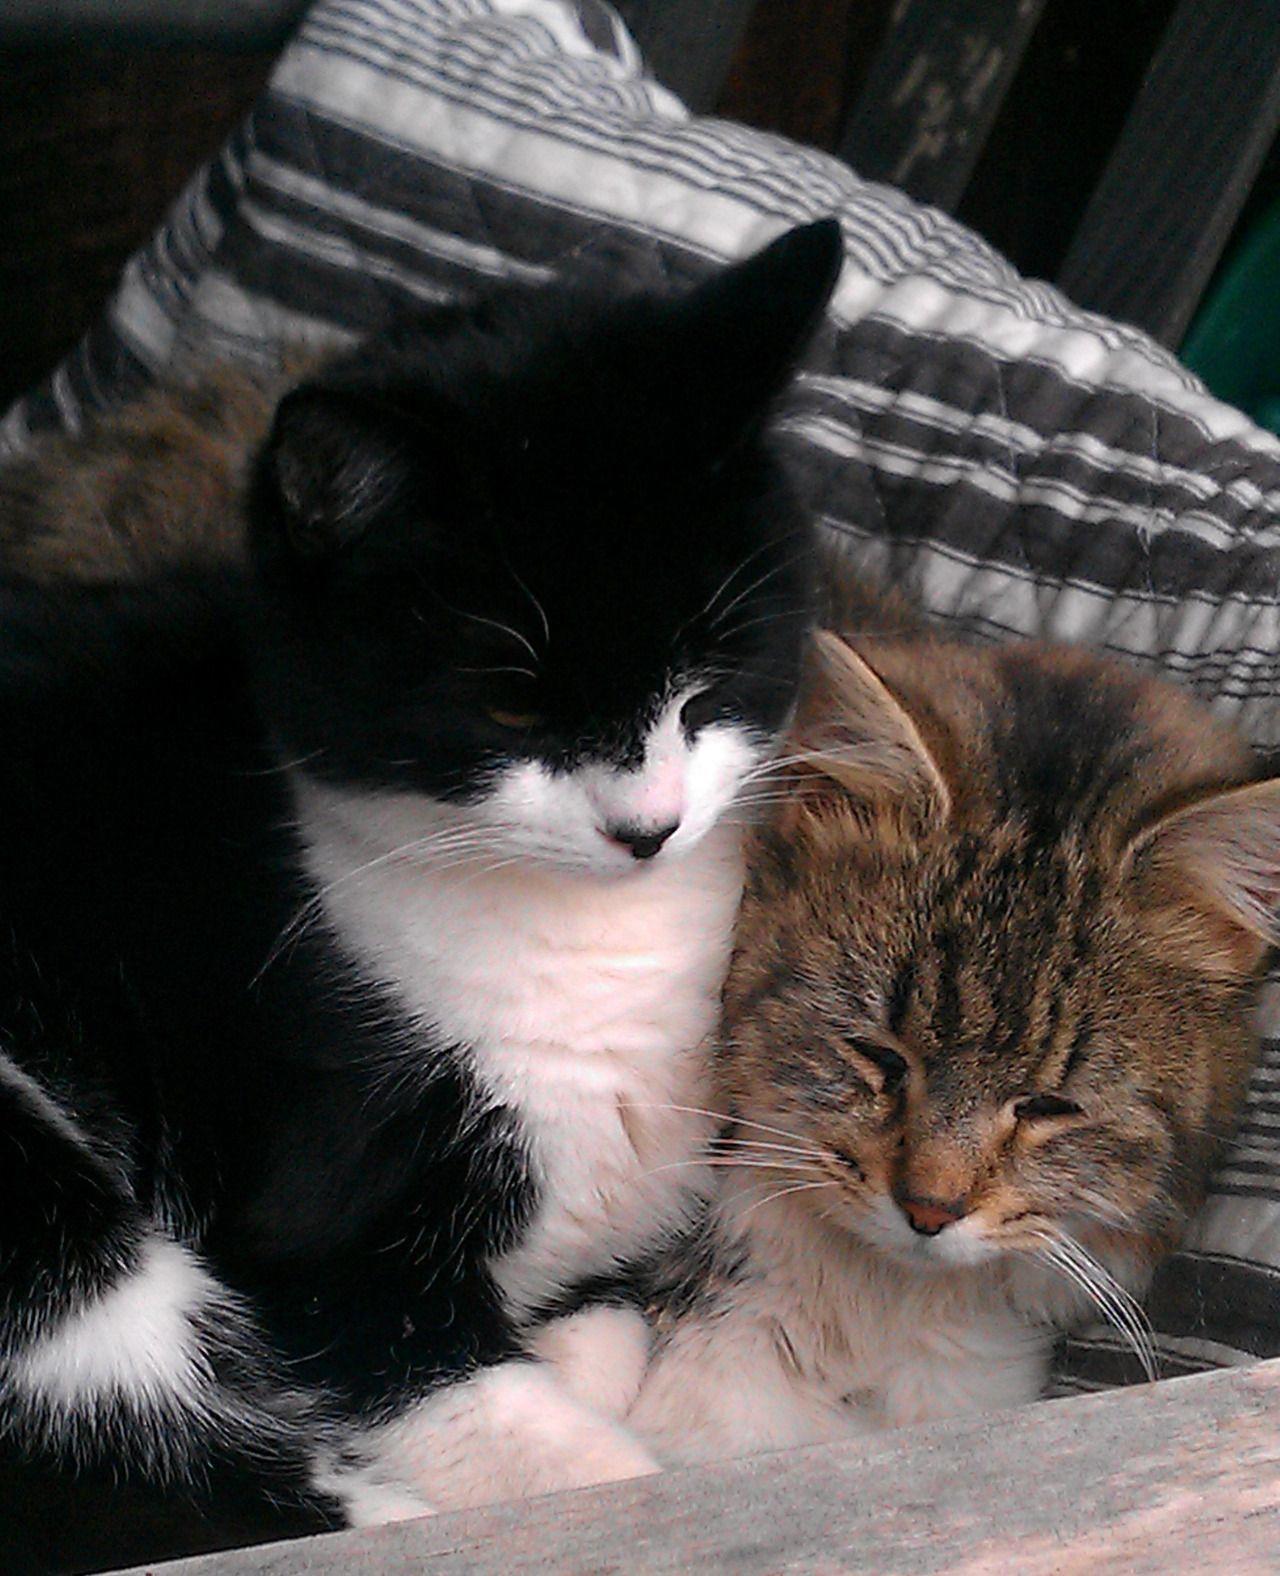 CyBeRGaTa Cats, Memes, New Mexico http//cybergata